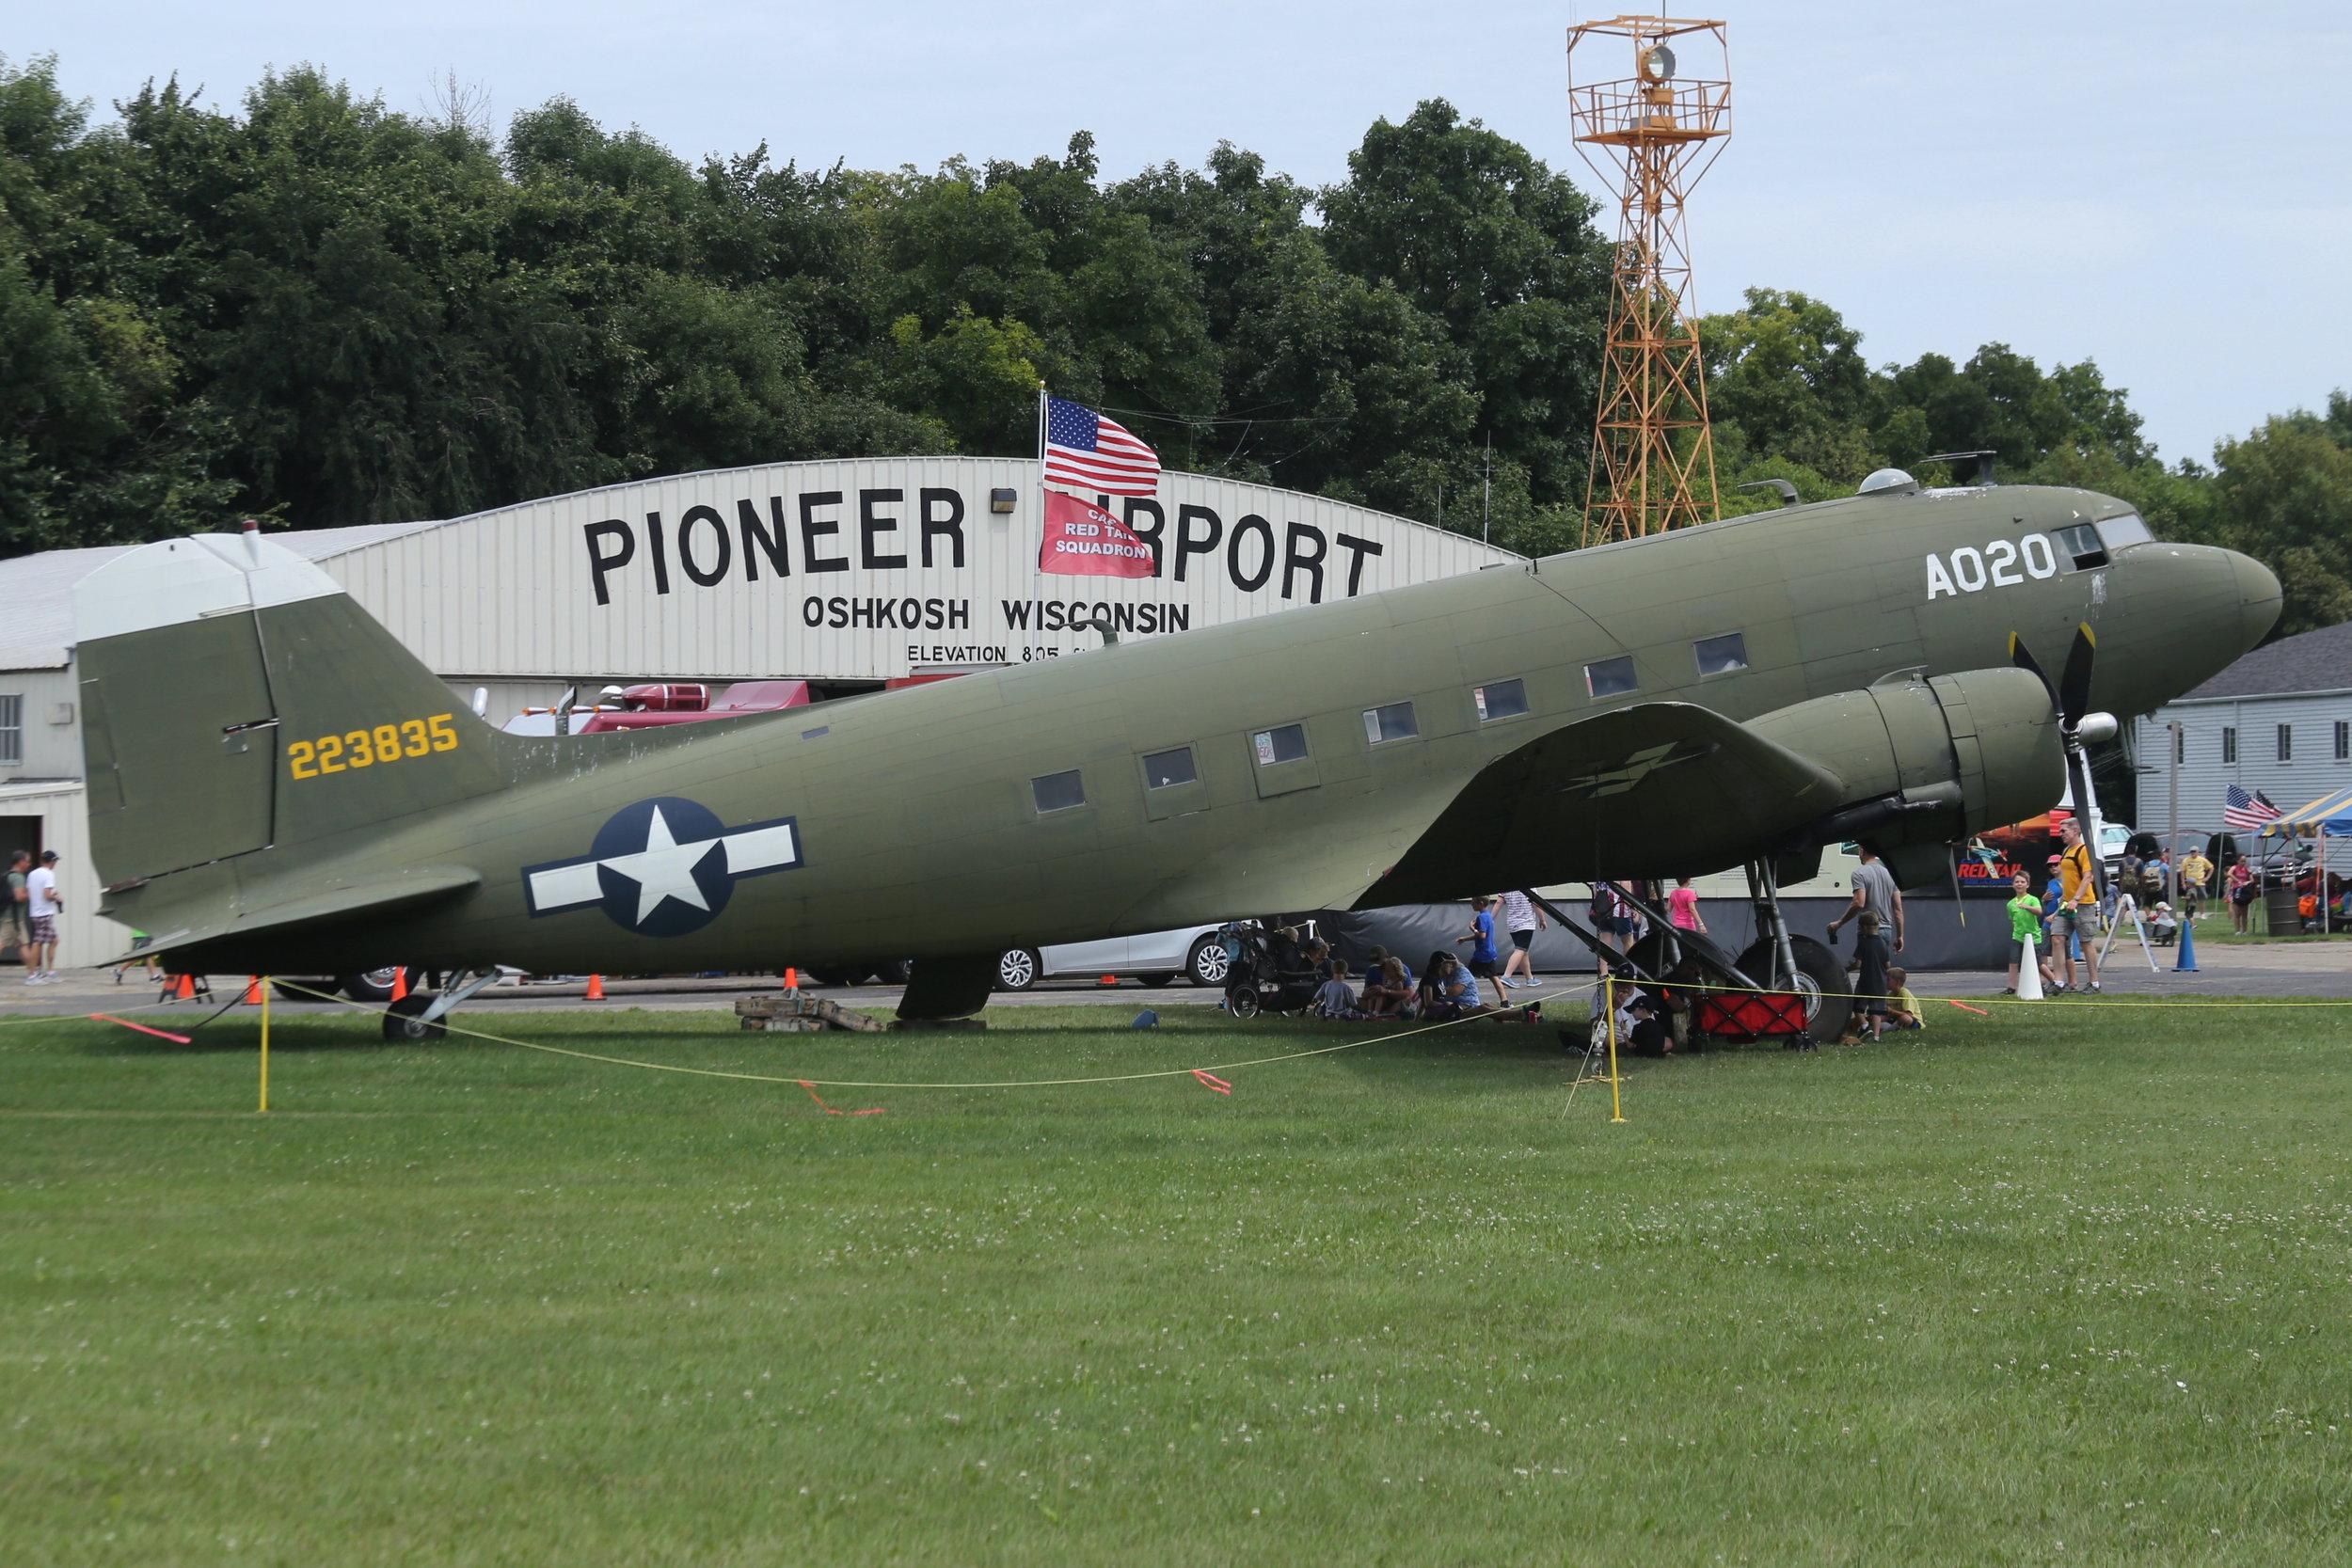 N7772 (223835) DC3 taken at Pioneer Airport Oshkosh 25th July 2018 by John Wood